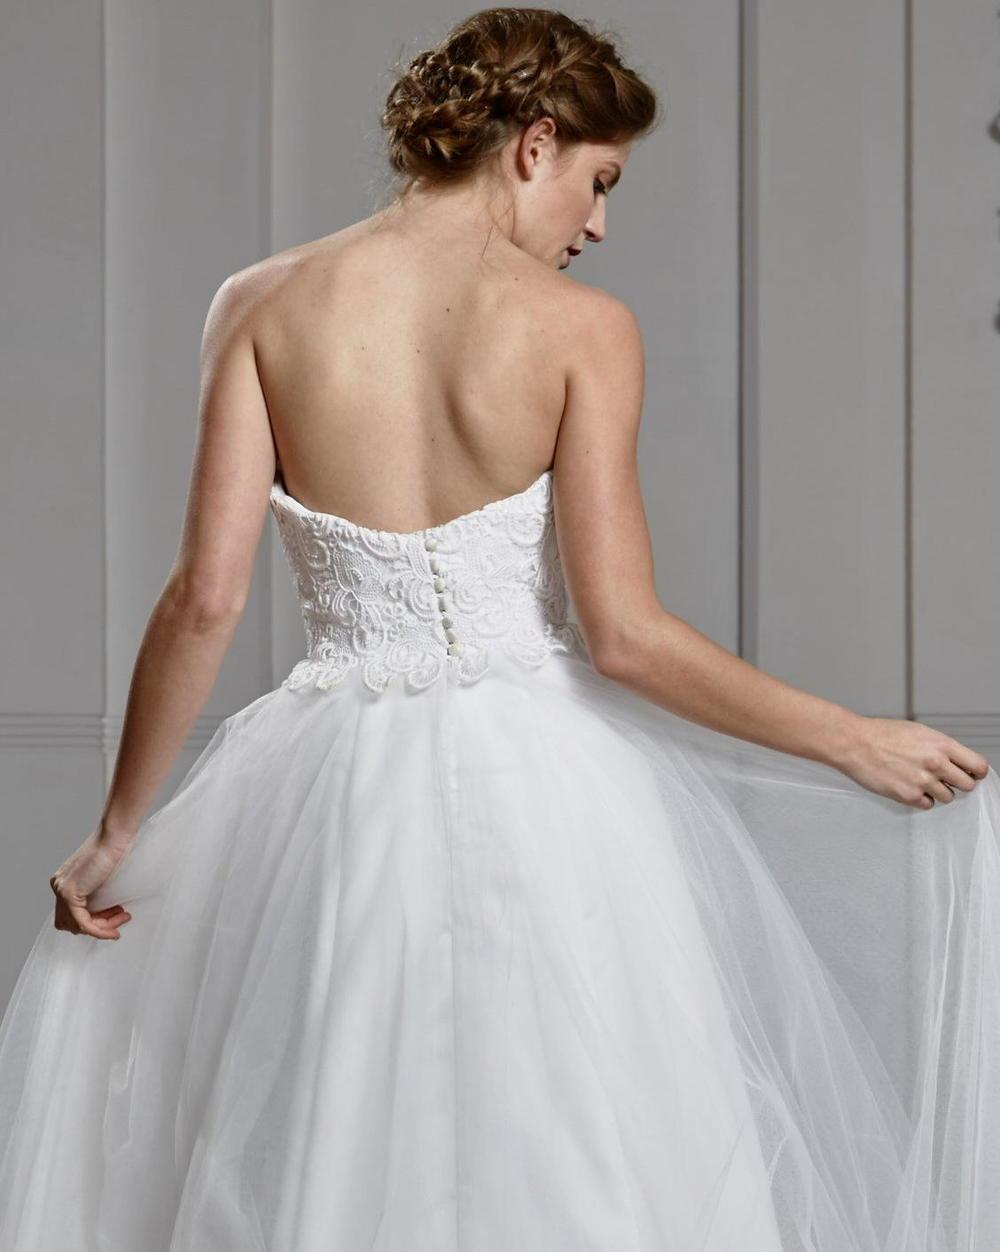 Rose bridal gown Tanya Anic Bridal photographyGrant Sparkes Carroll double bay sydney bridal_115 2.jpg